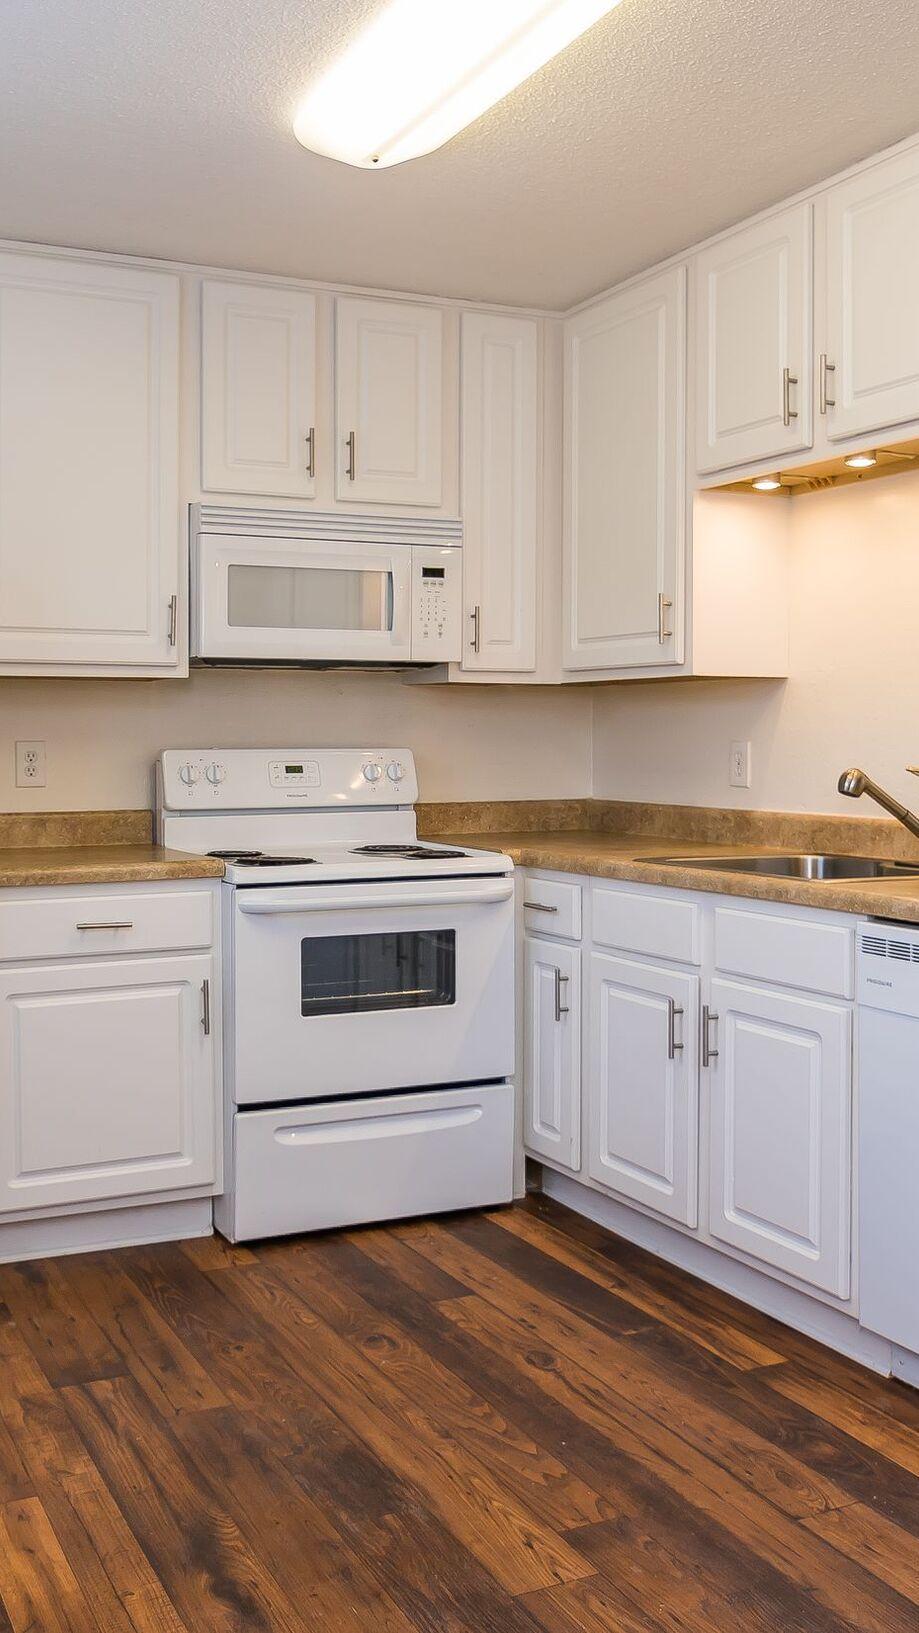 Salem Ridge Apartments in Winston Salem, NC